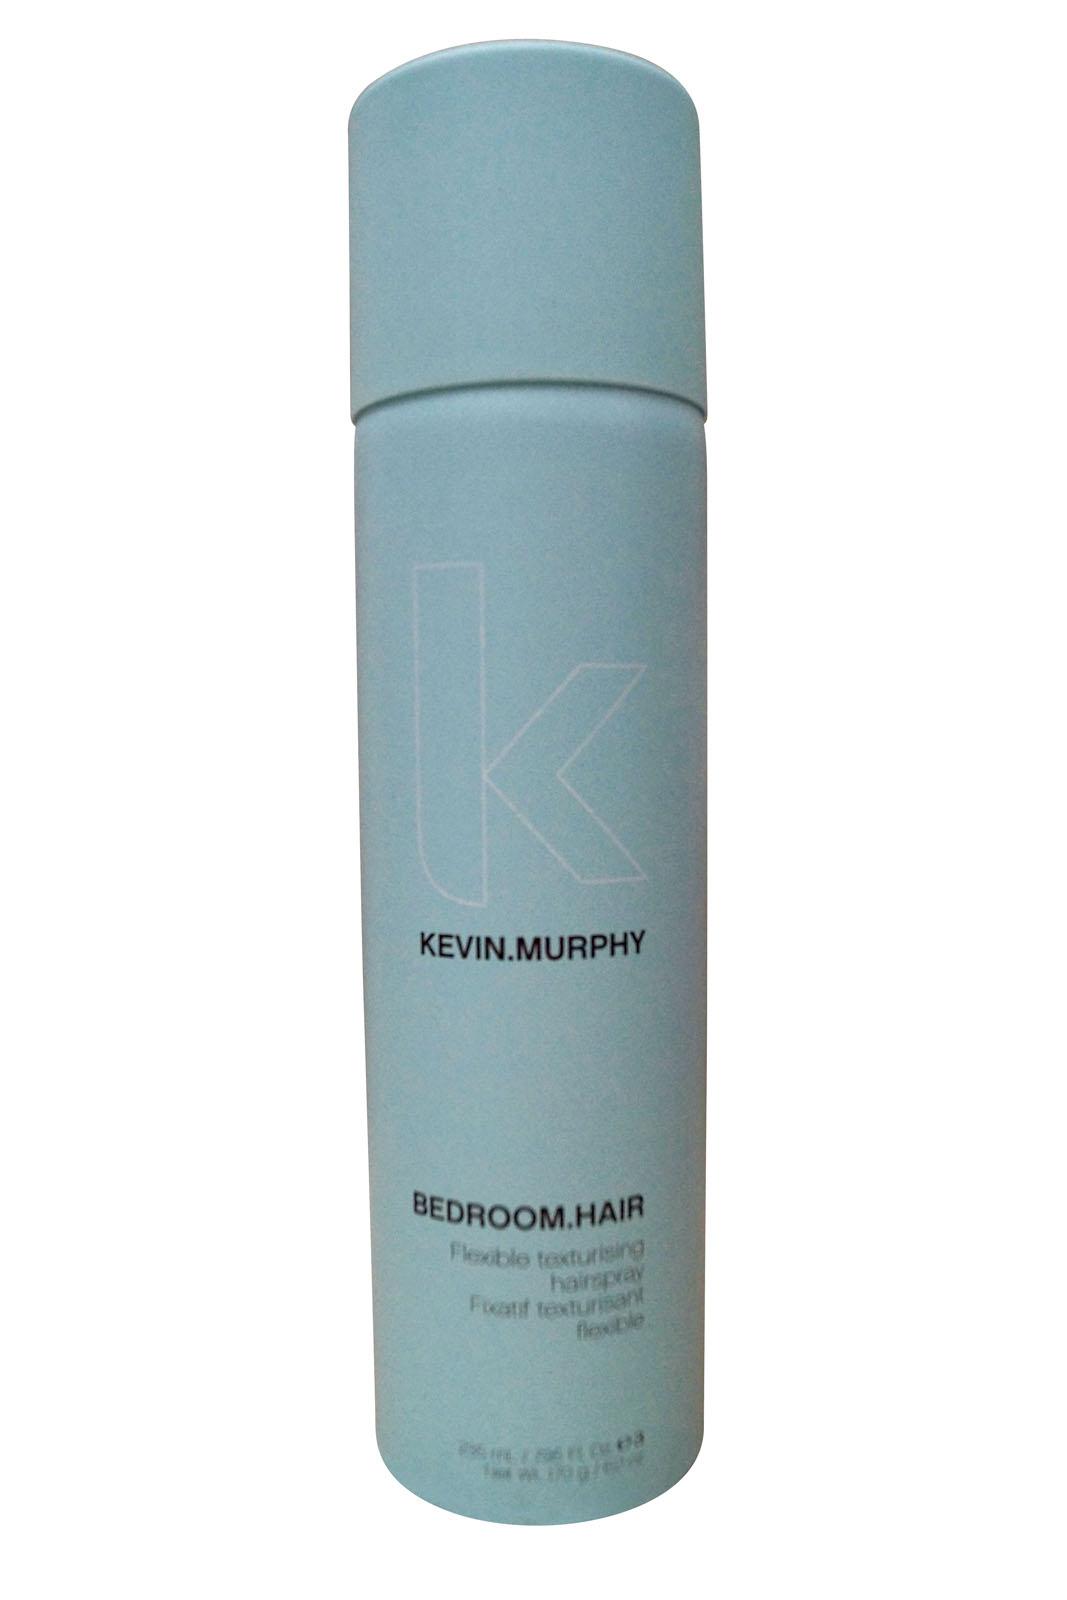 Kevin Murphy Bedroom Hair Flexible Texturizing Hairspray 7 ...